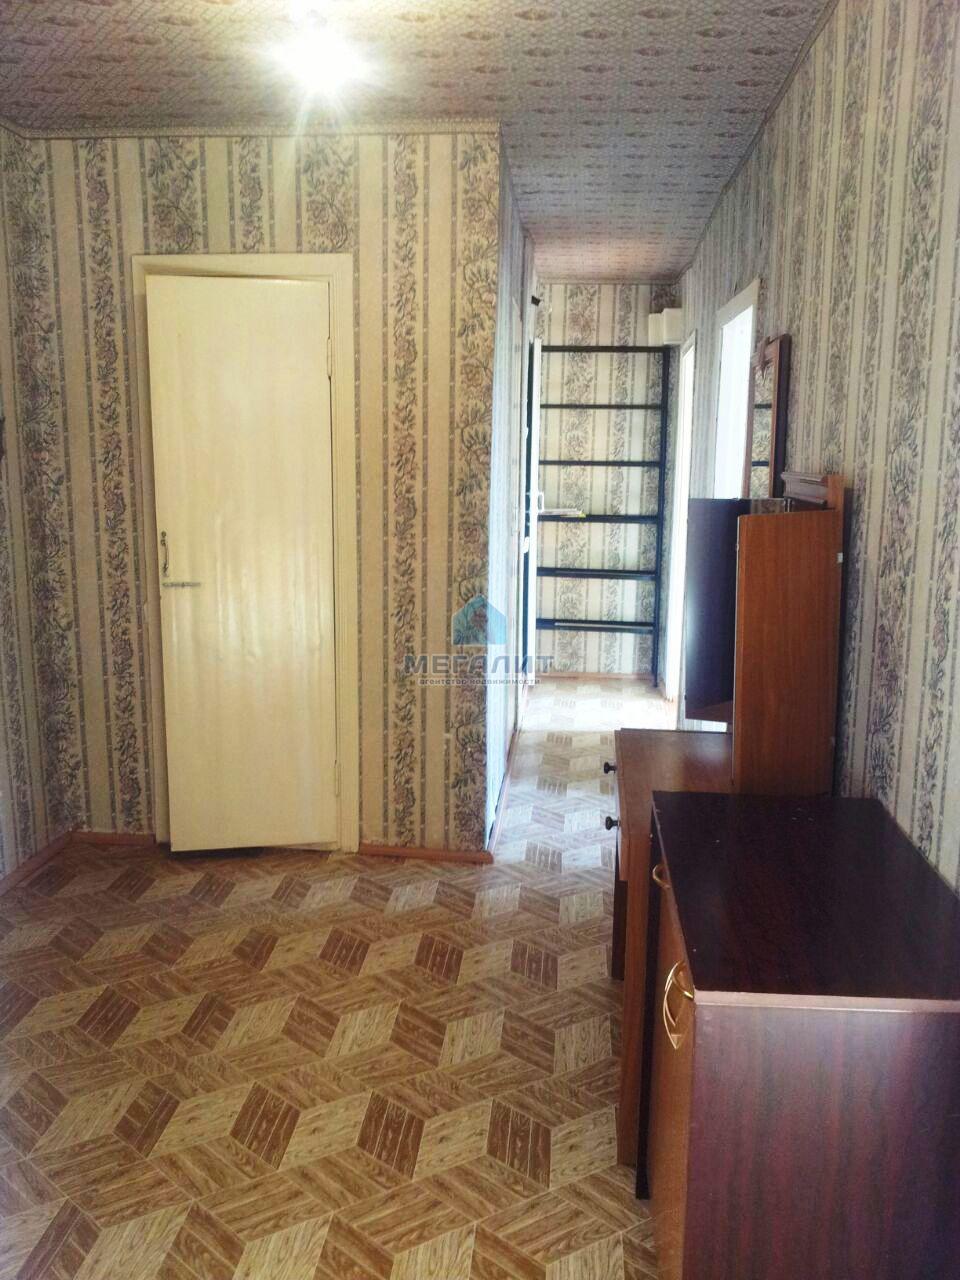 Двухкомнатная квартира в Ново-Савиновском районе! (миниатюра №2)